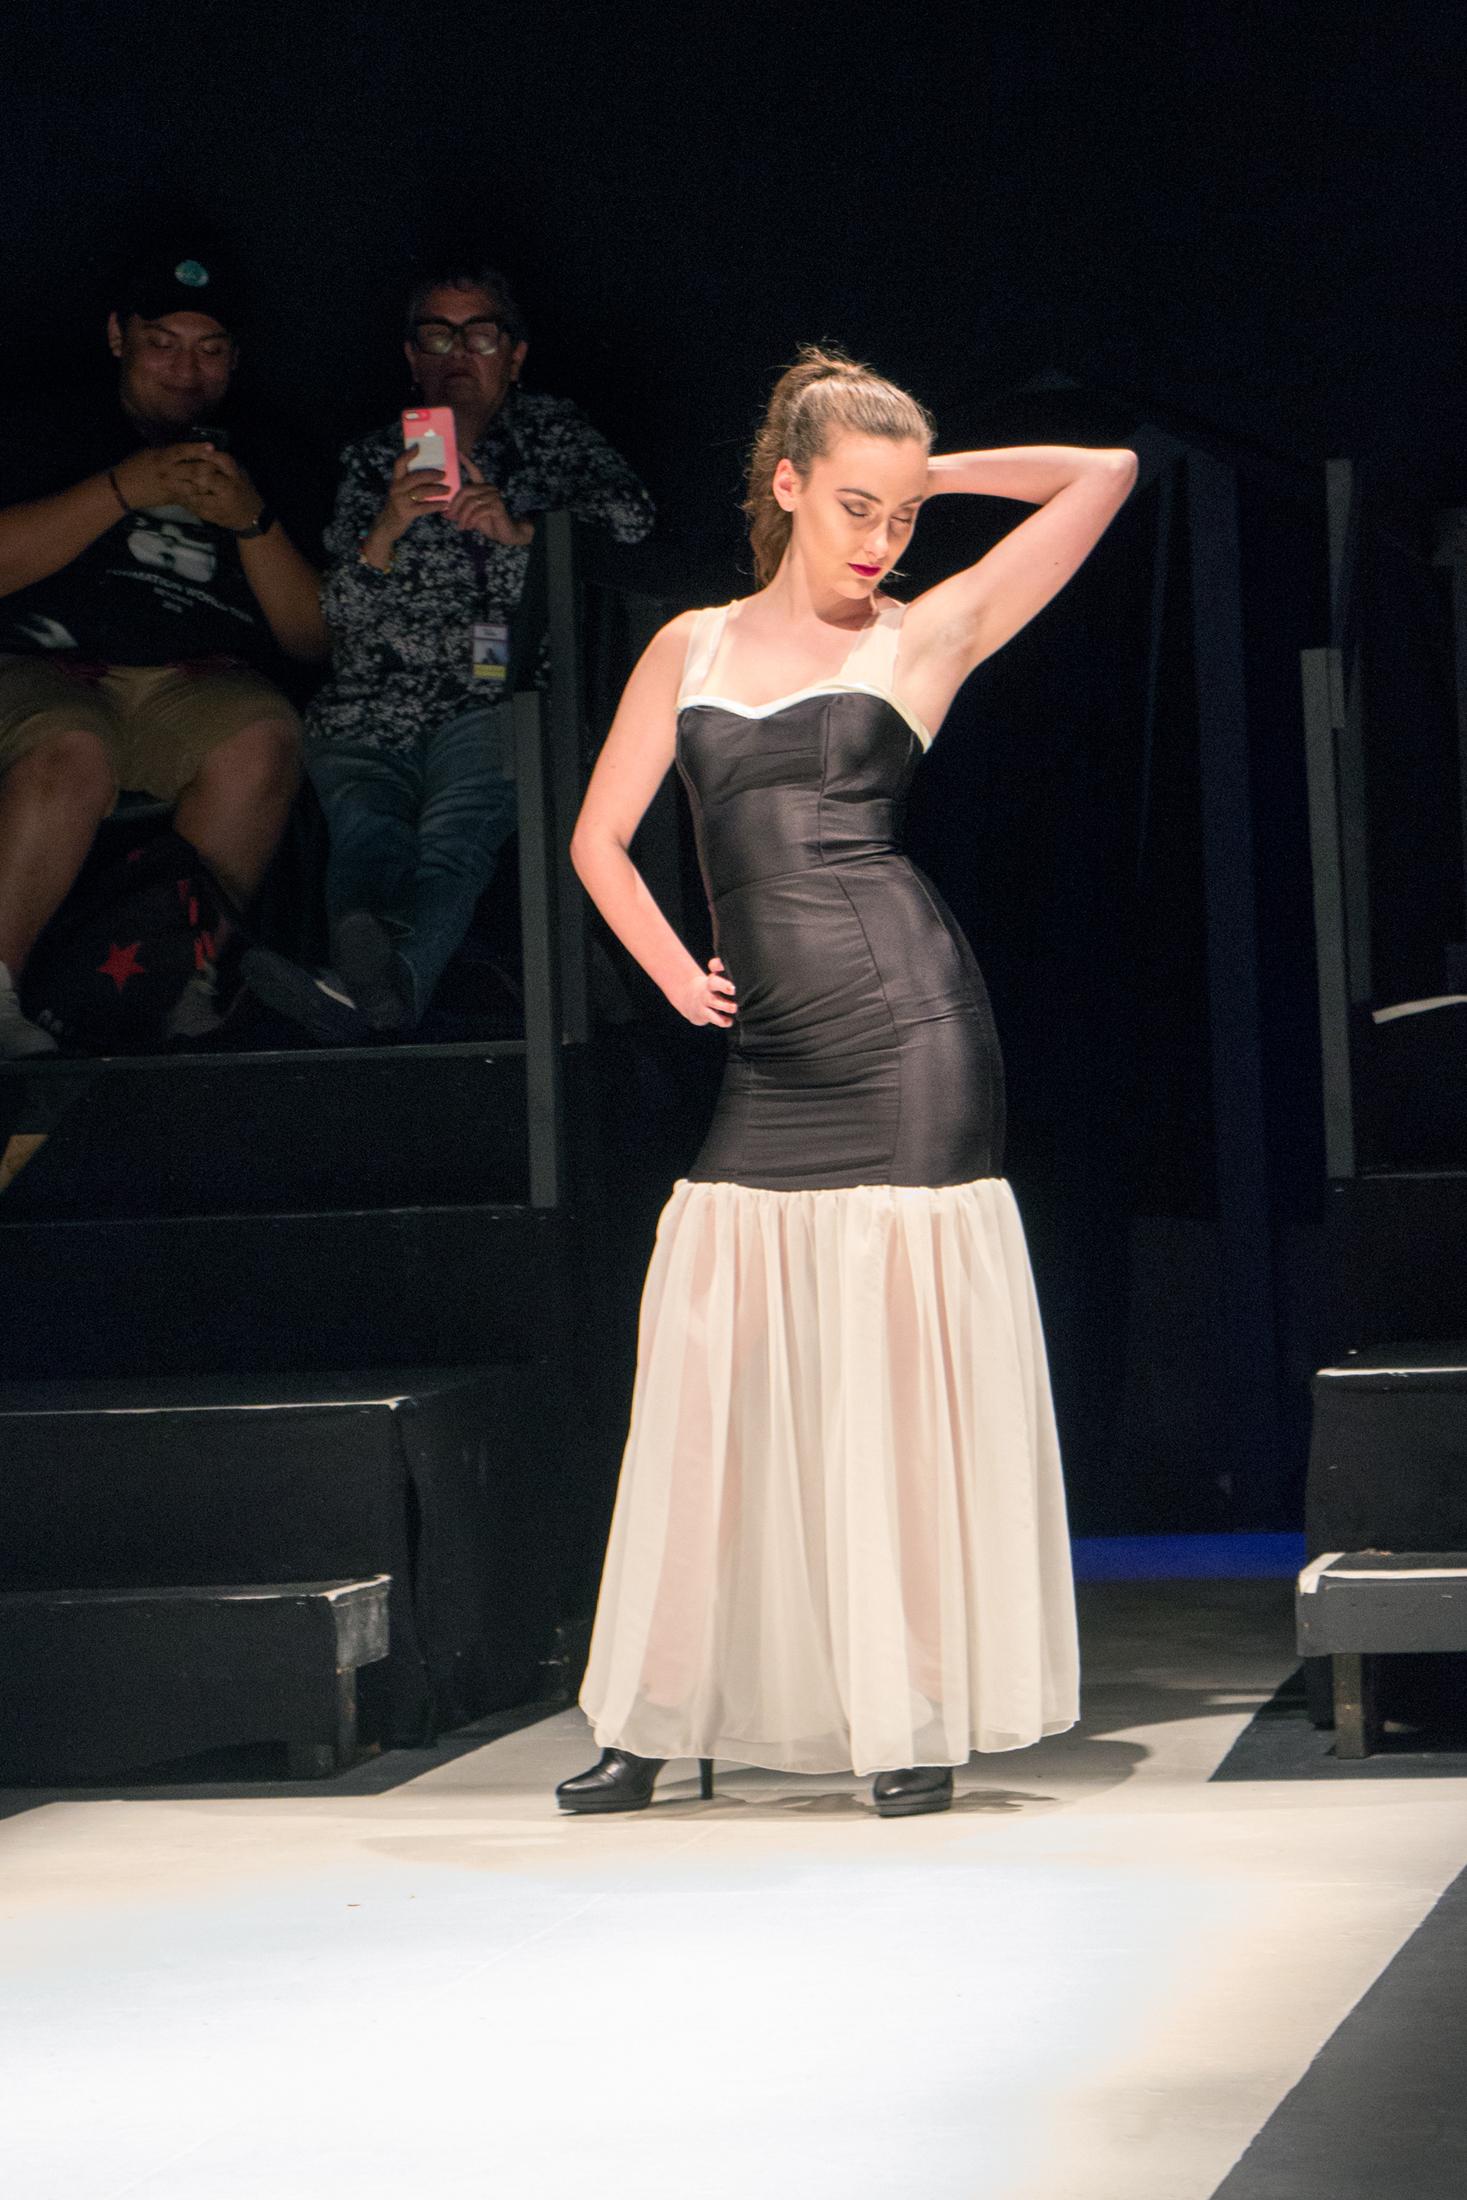 OSA-Fashion-2017-Justene Anderson-GregGutbezahl-23.jpg